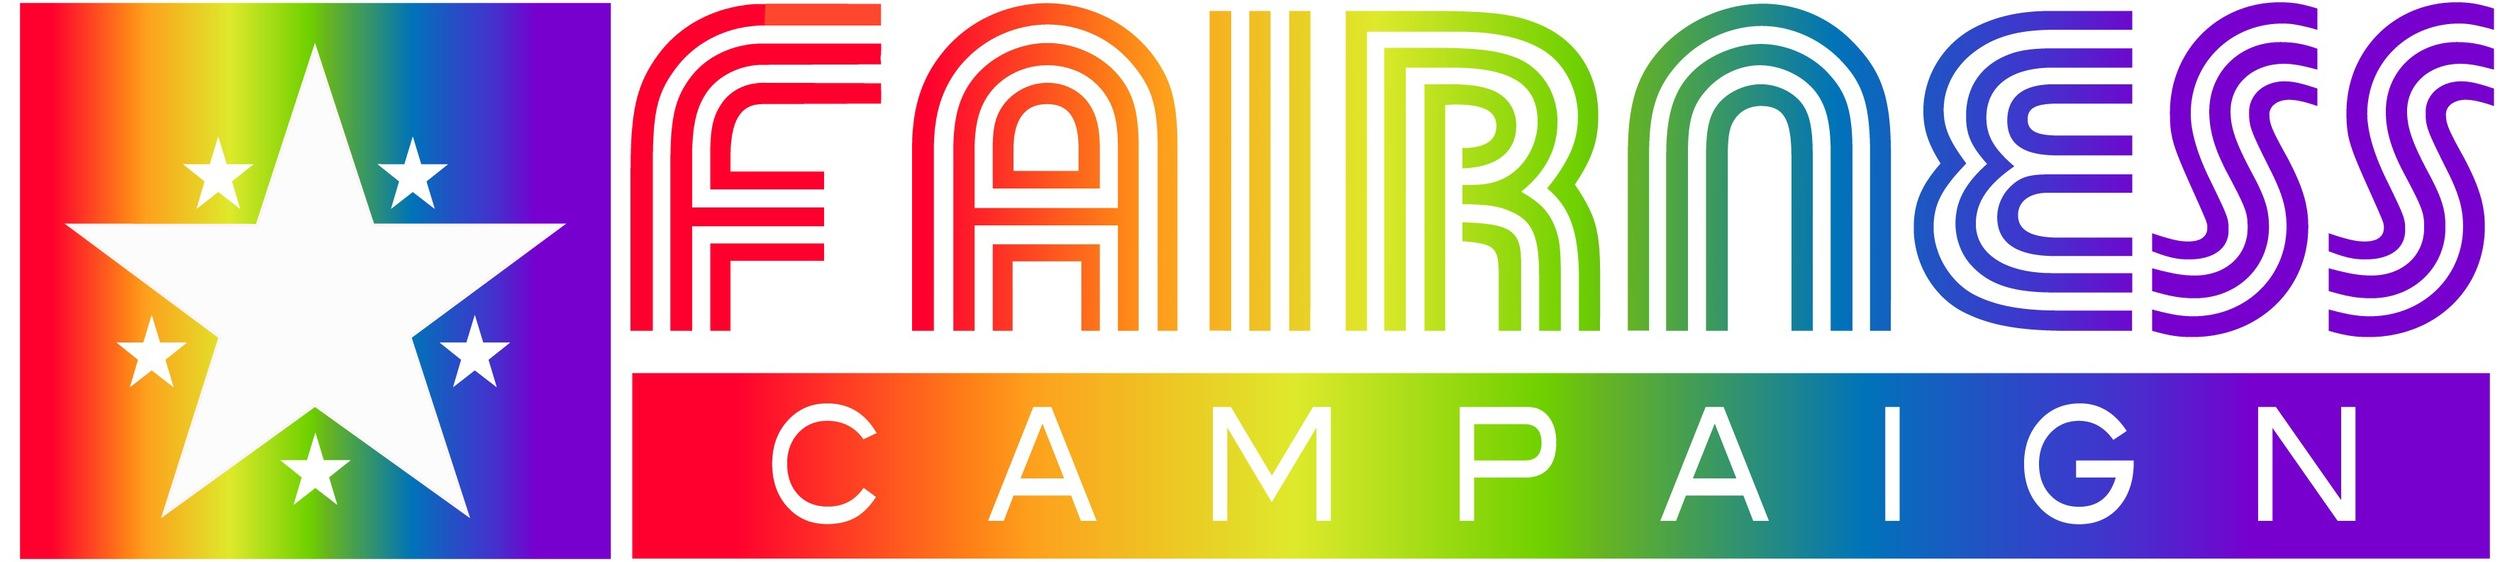 2012 Rainbow Header-fixed.jpg